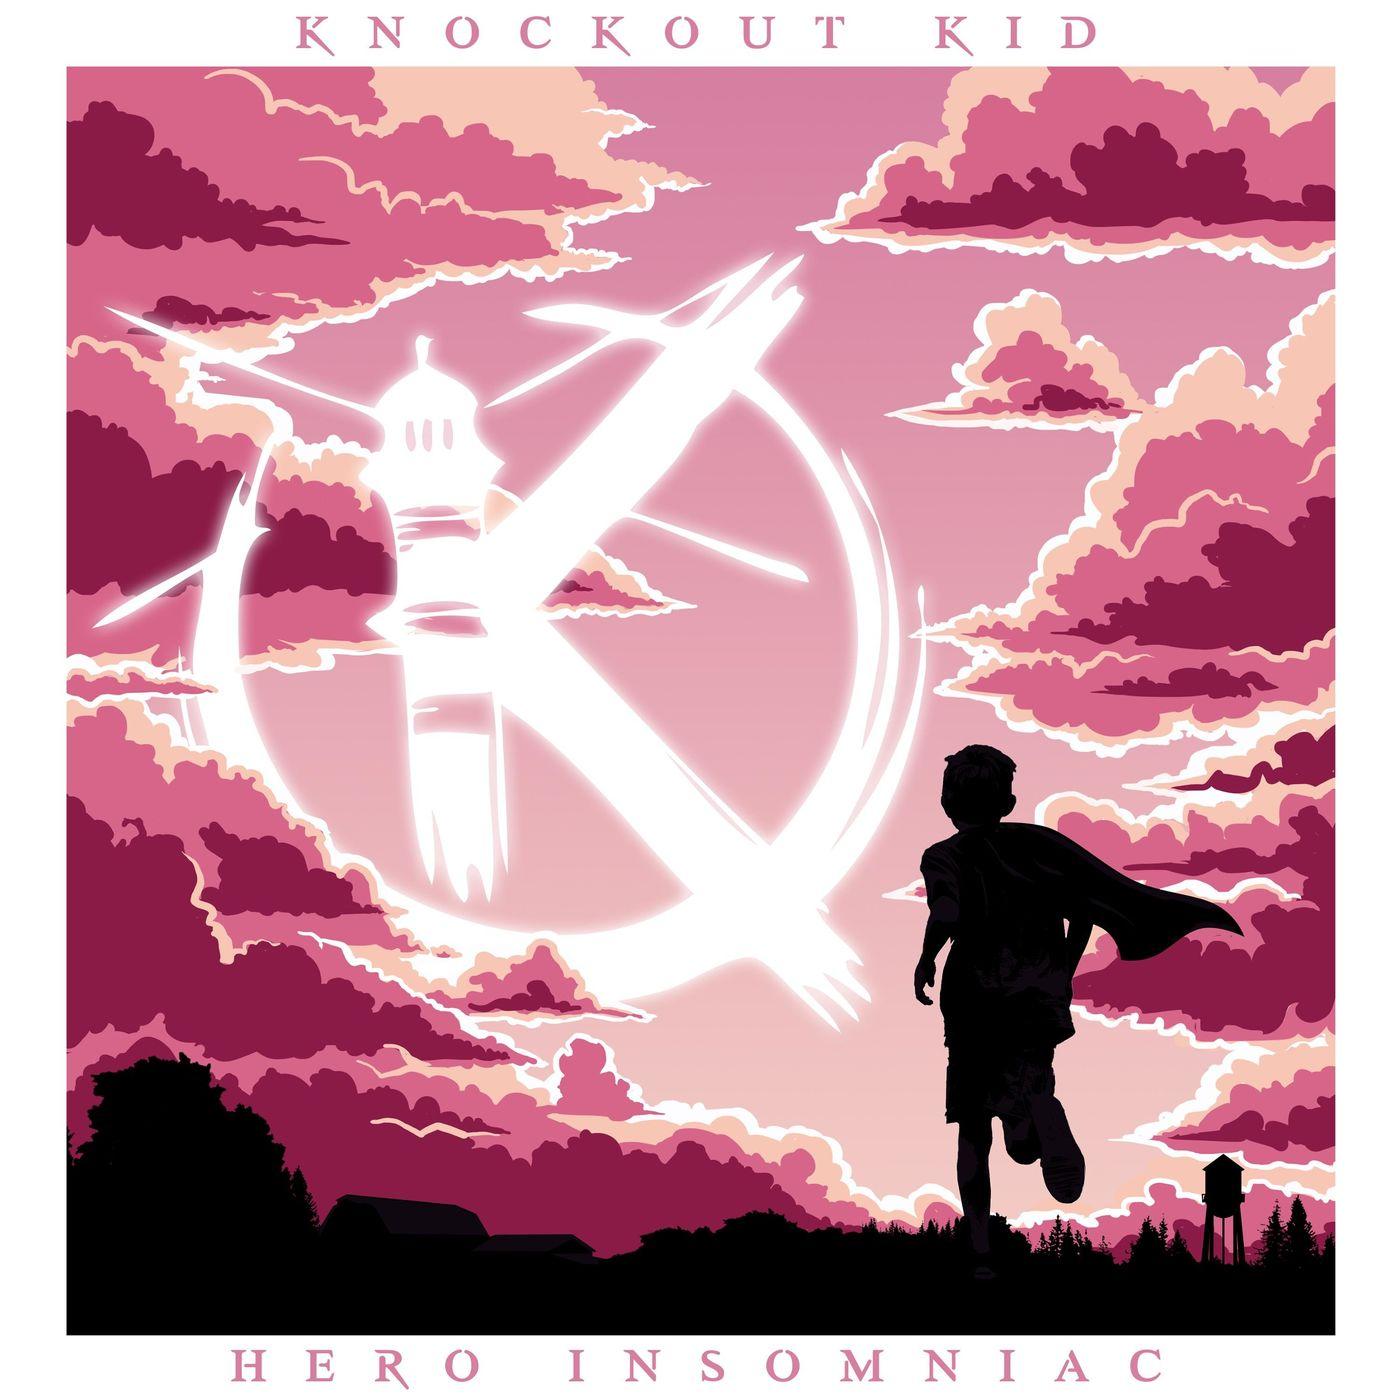 Knockout Kid - Hero Insomniac [single] (2020)